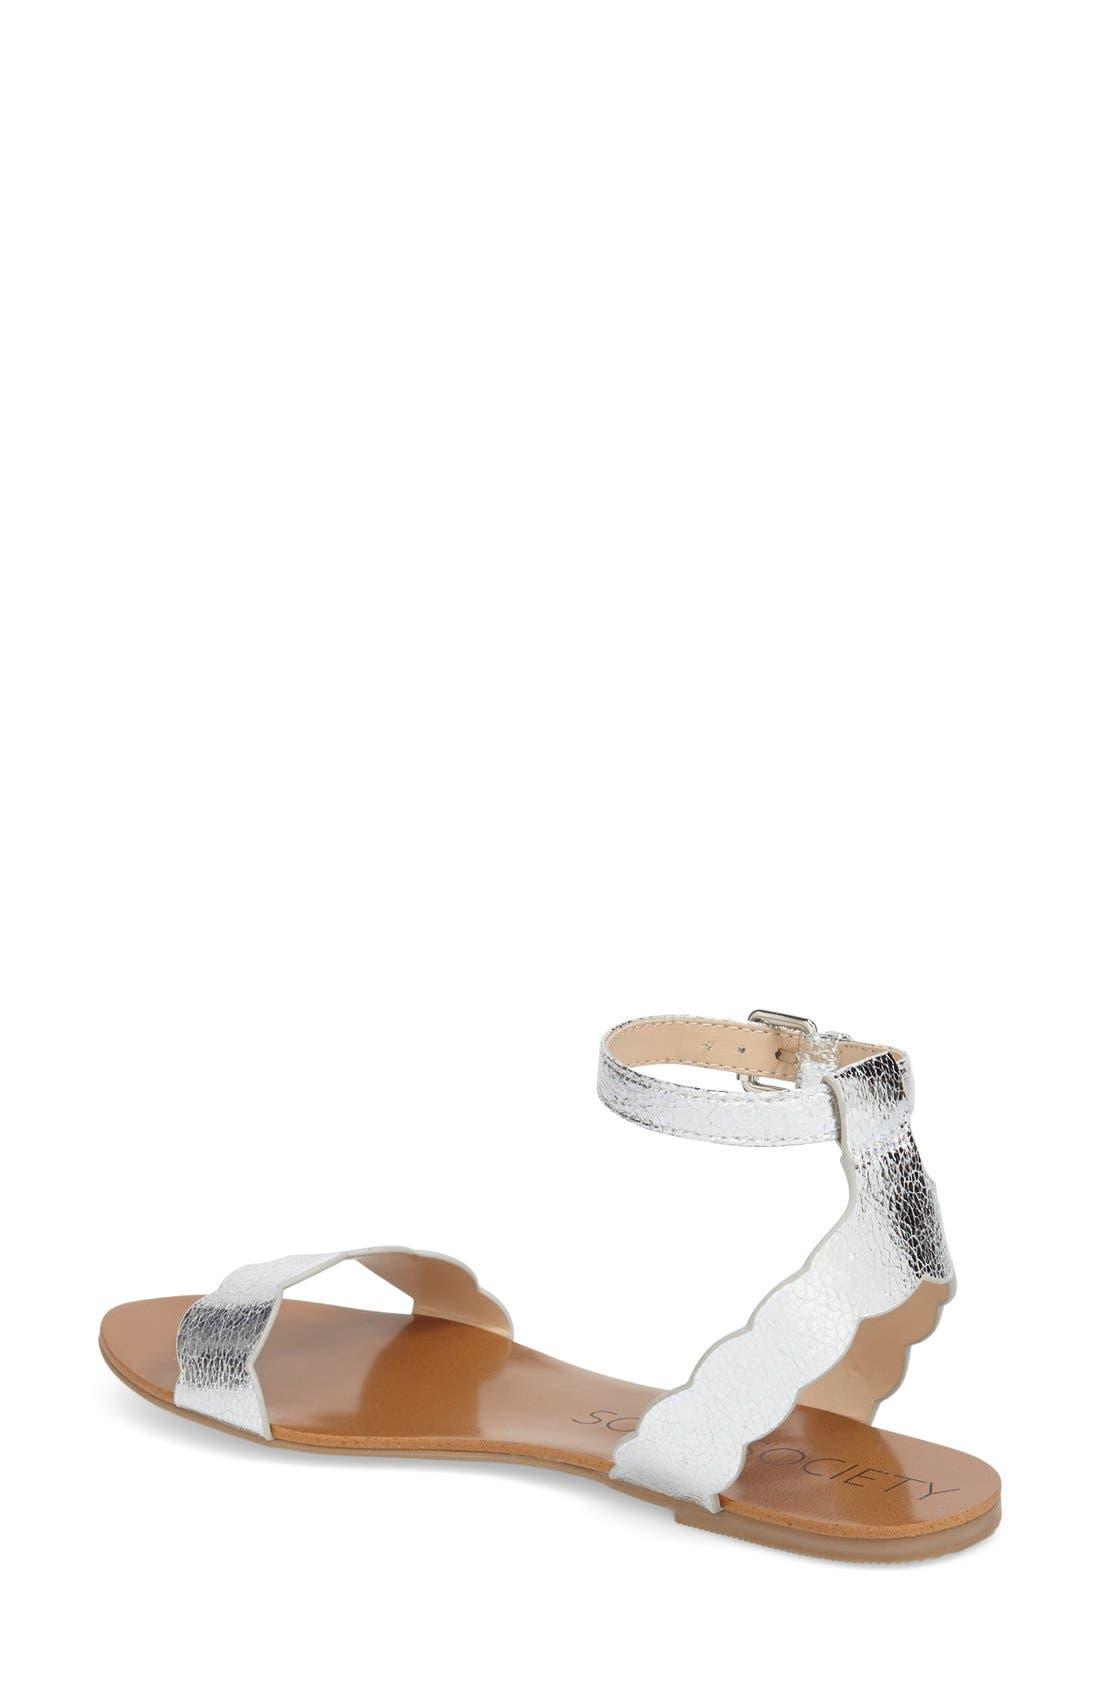 'Odette' Scalloped Ankle Strap Flat Sandal,                             Alternate thumbnail 25, color,